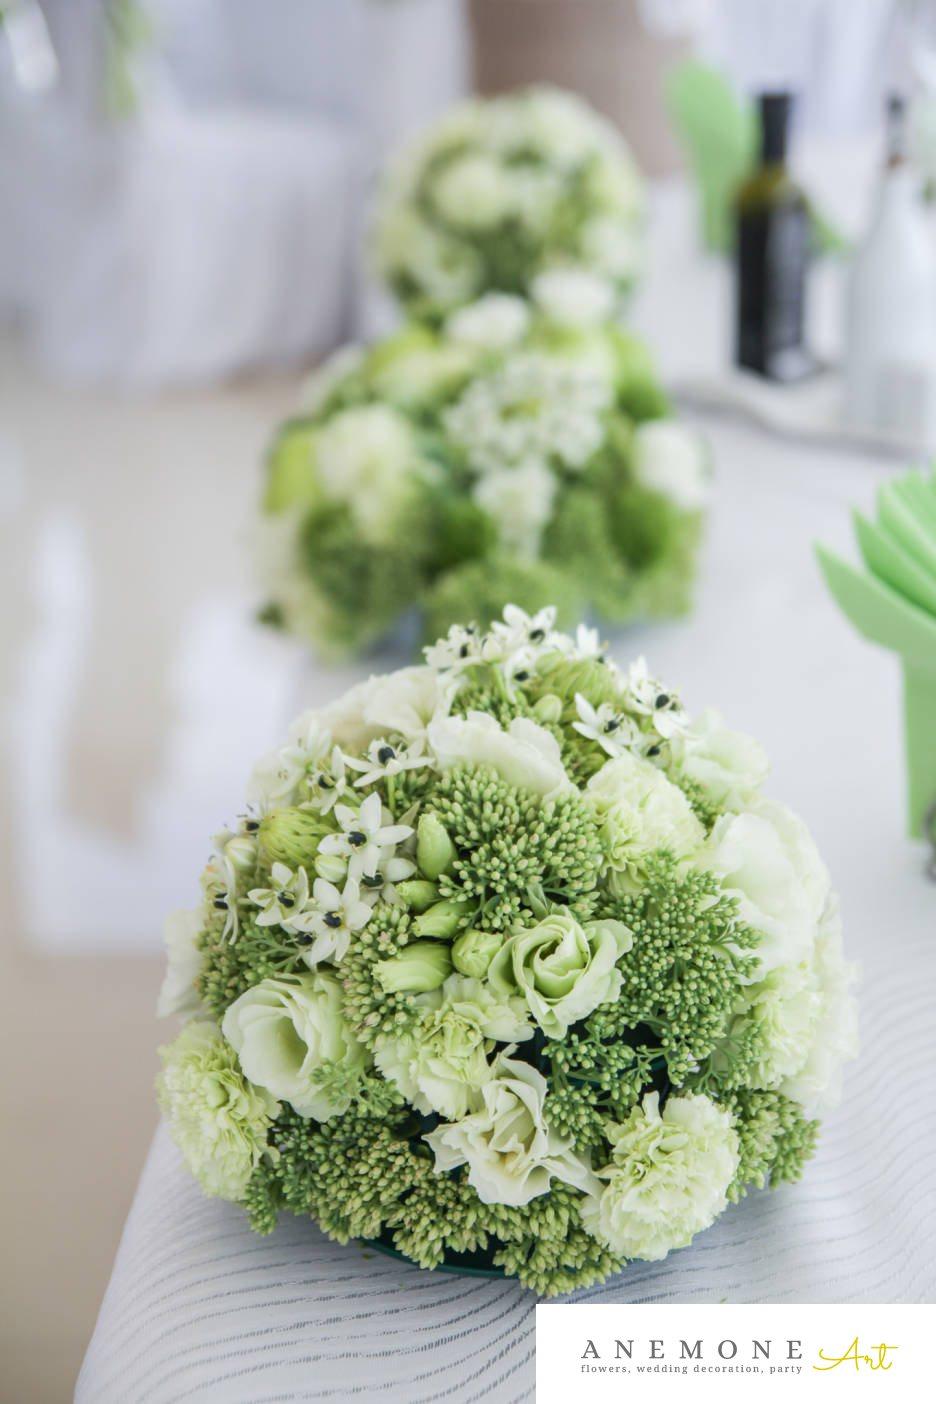 Poza, foto cu Flori de nunta alb, decor masa, garoafe, lisianthus, ornitogallum, sebum, trandafiri, verde in Arad, Timisoara, Oradea (wedding flowers, bouquets) nunta Arad, Timisoara, Oradea